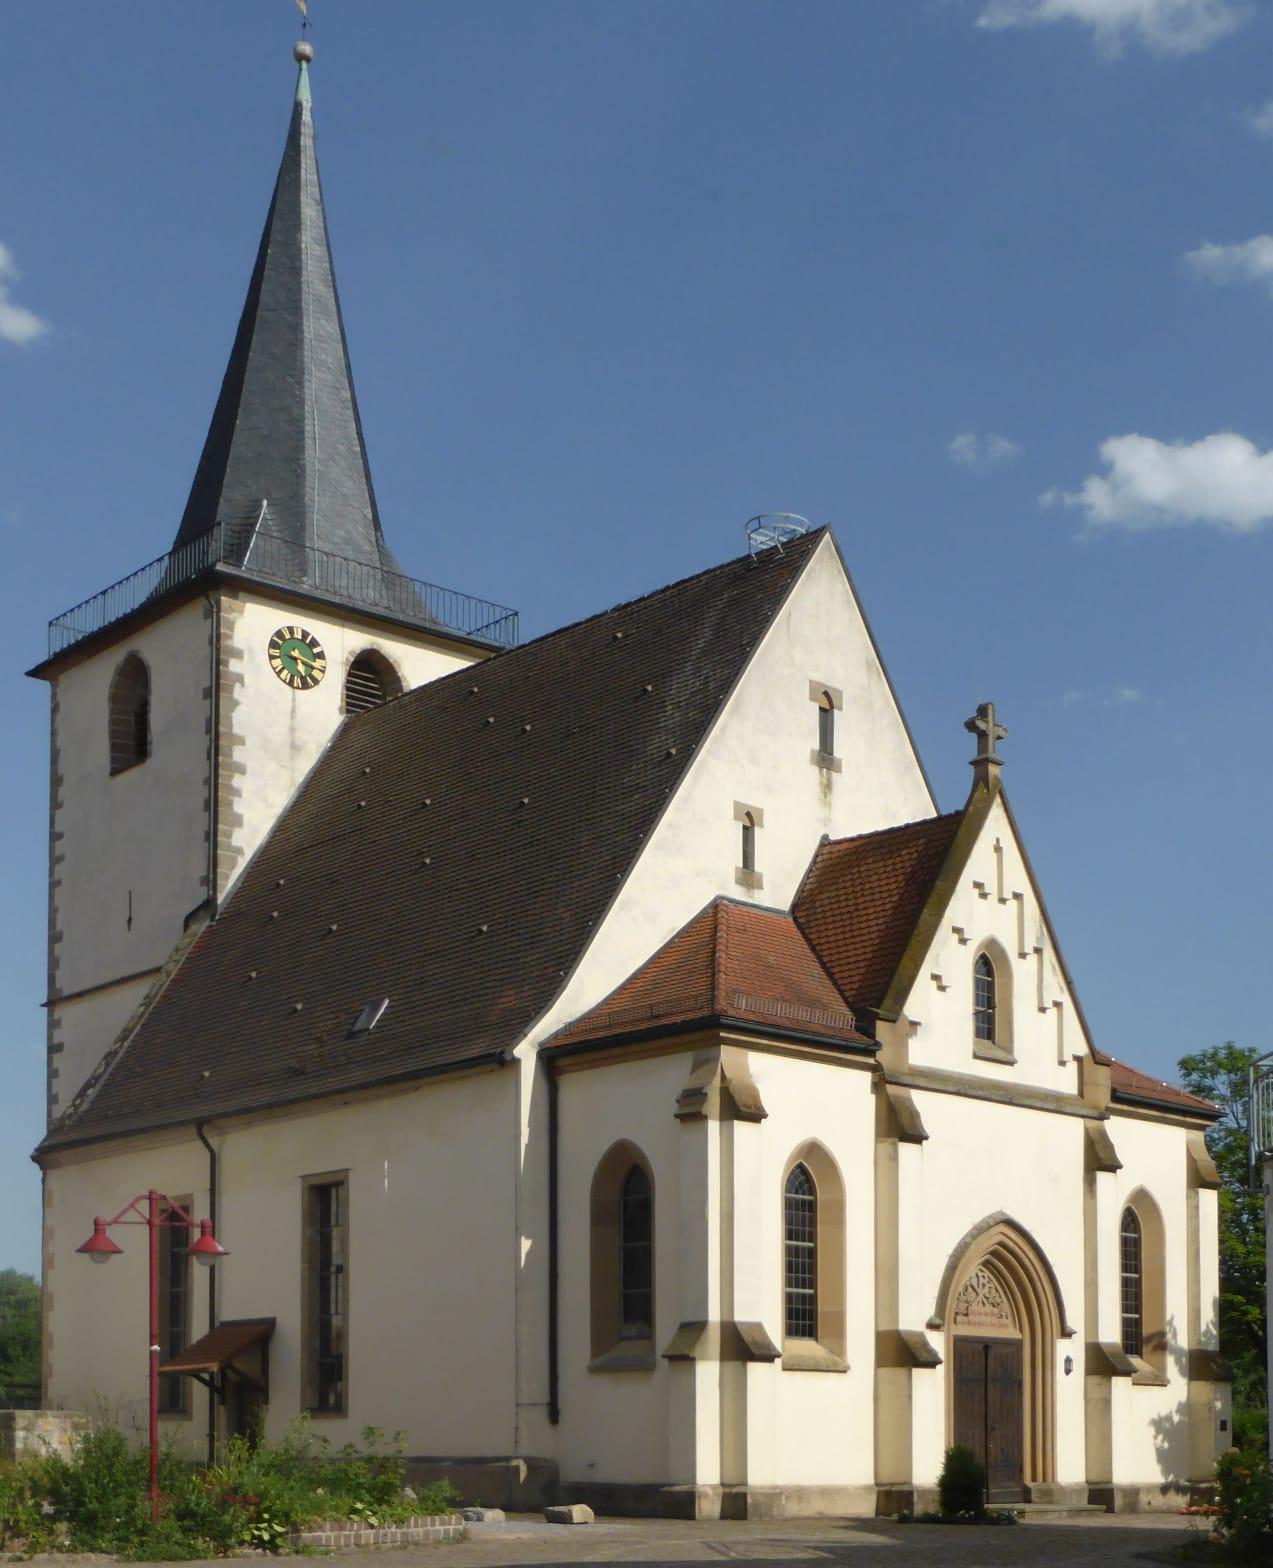 Pfarrer datieren Gemeinde